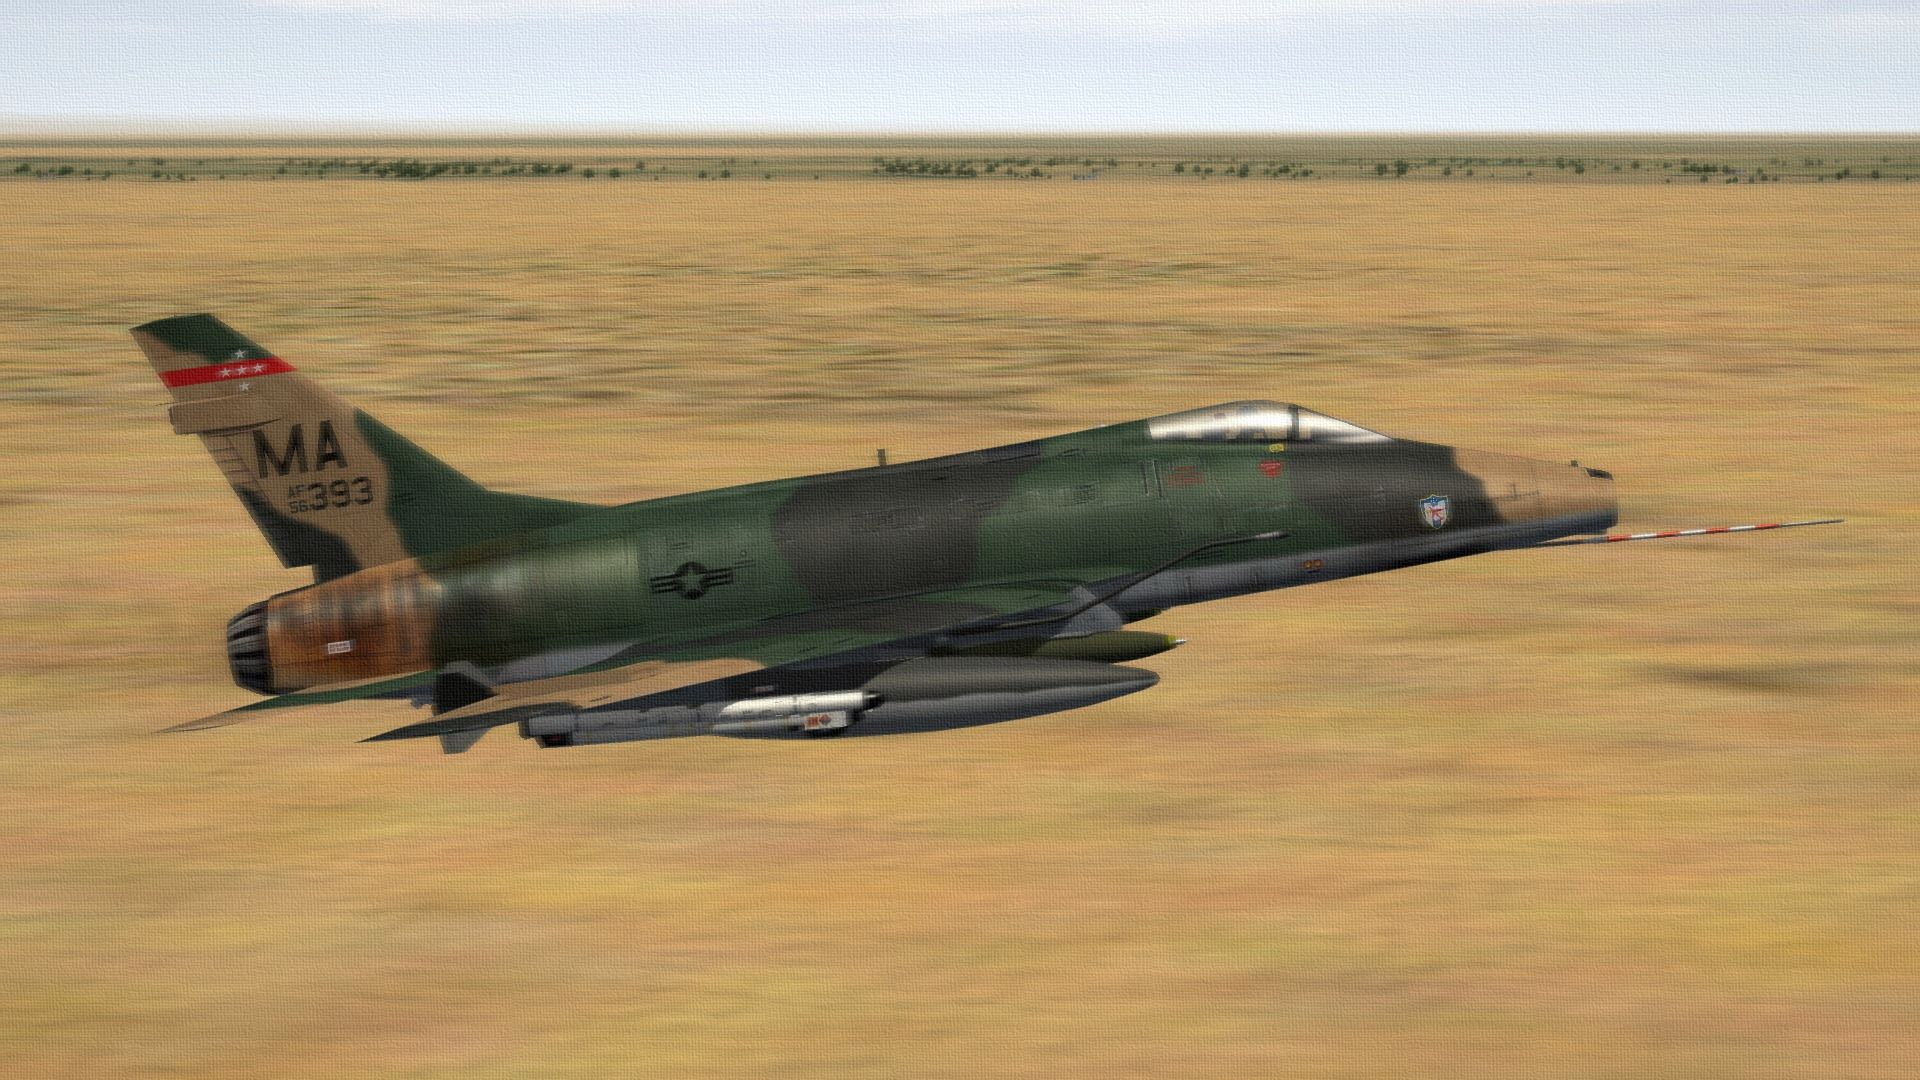 USAF%20F-100G%20SUPER%20SABRE.04_zps2idk